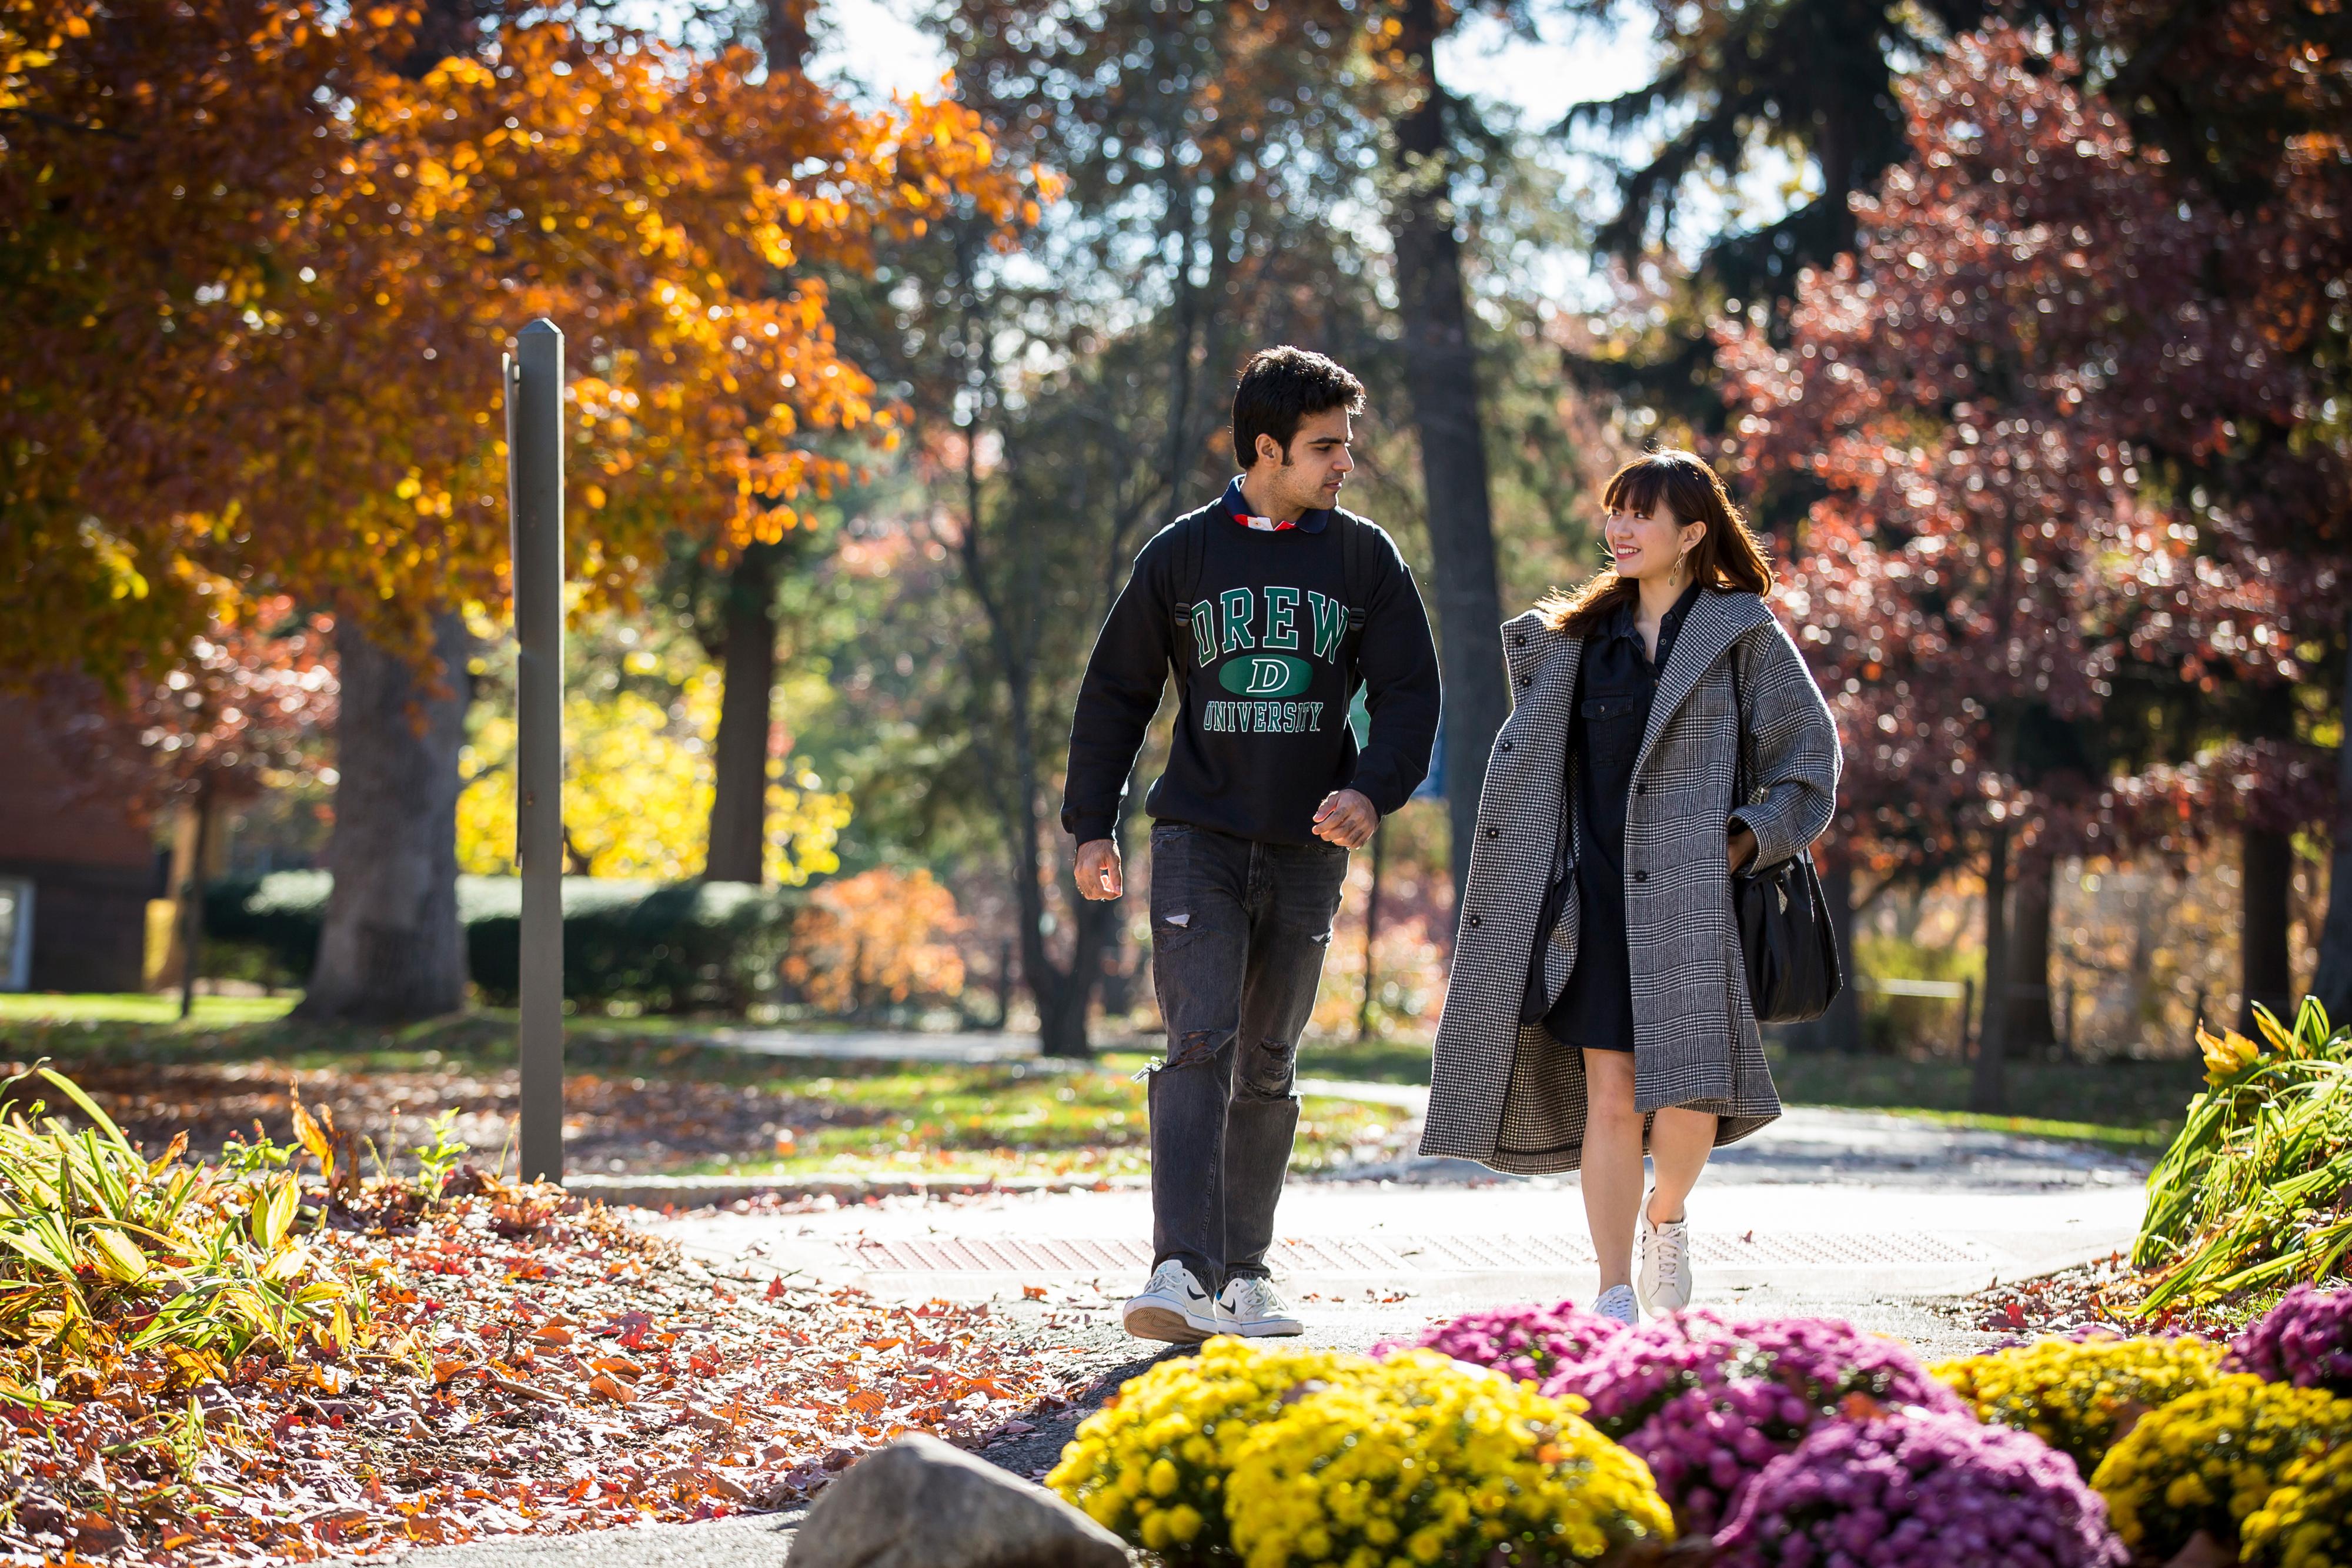 Drew international students on campus